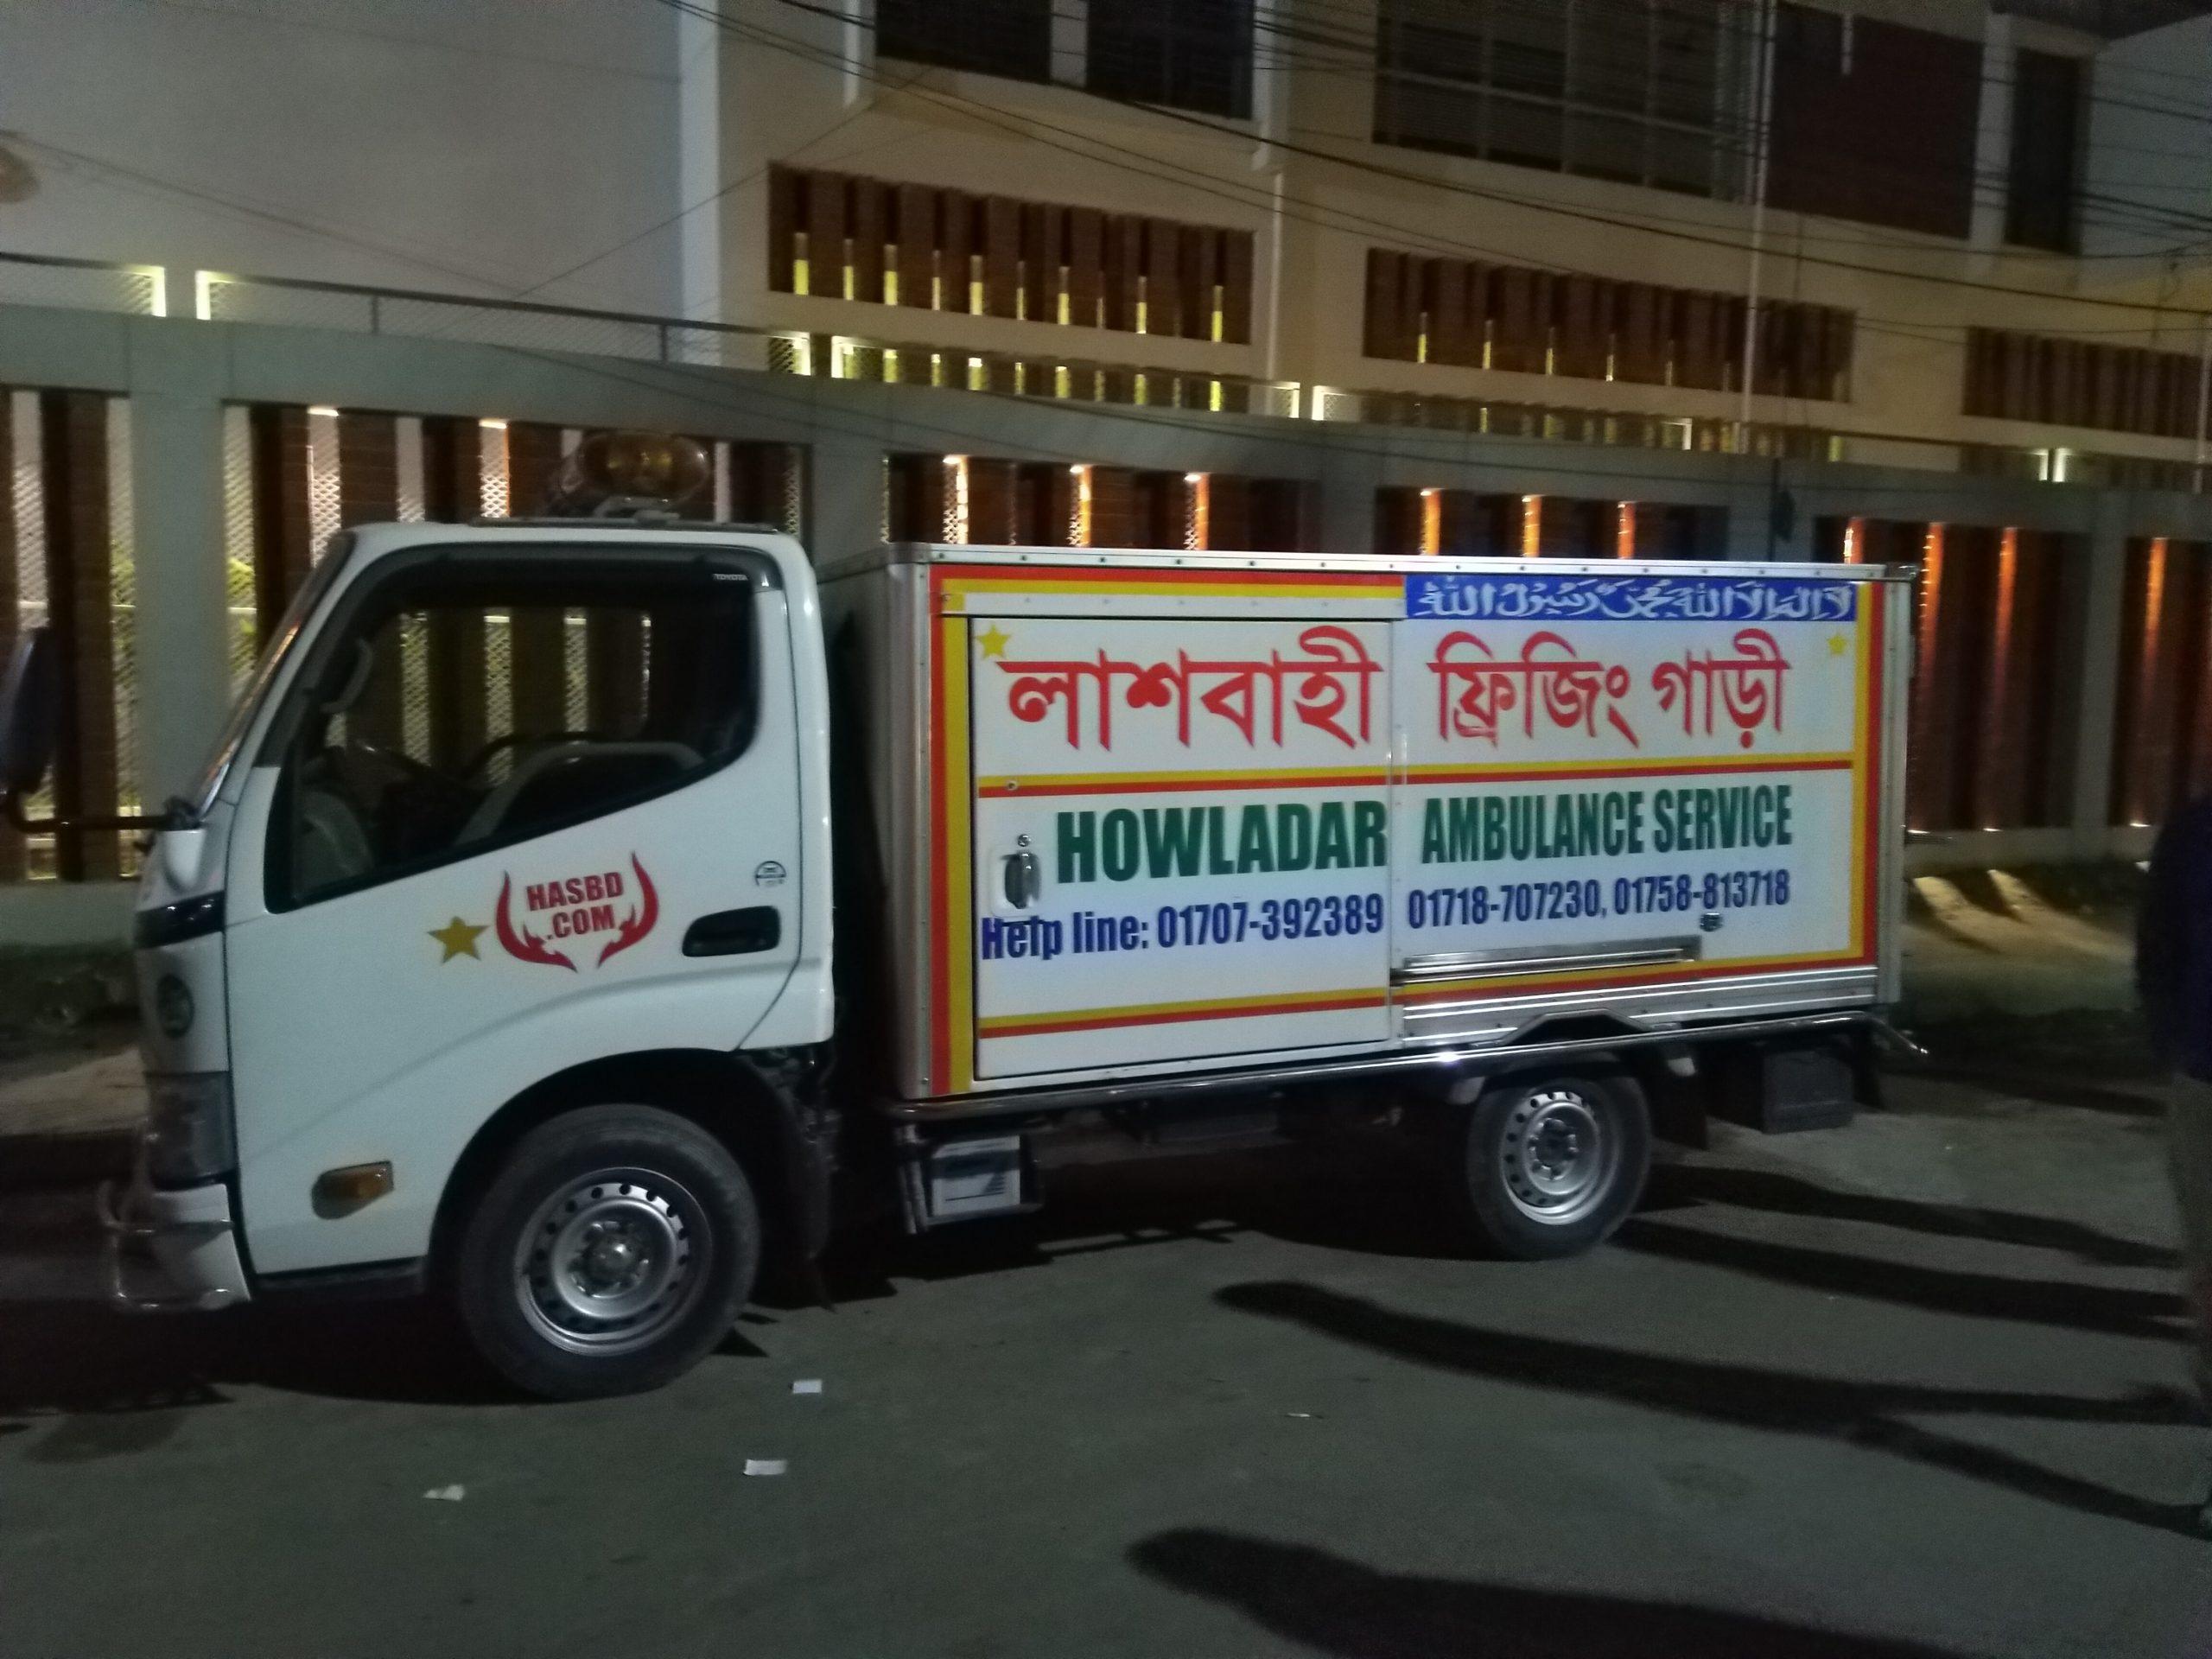 Freezer-ambulance-service-in-Dhaka